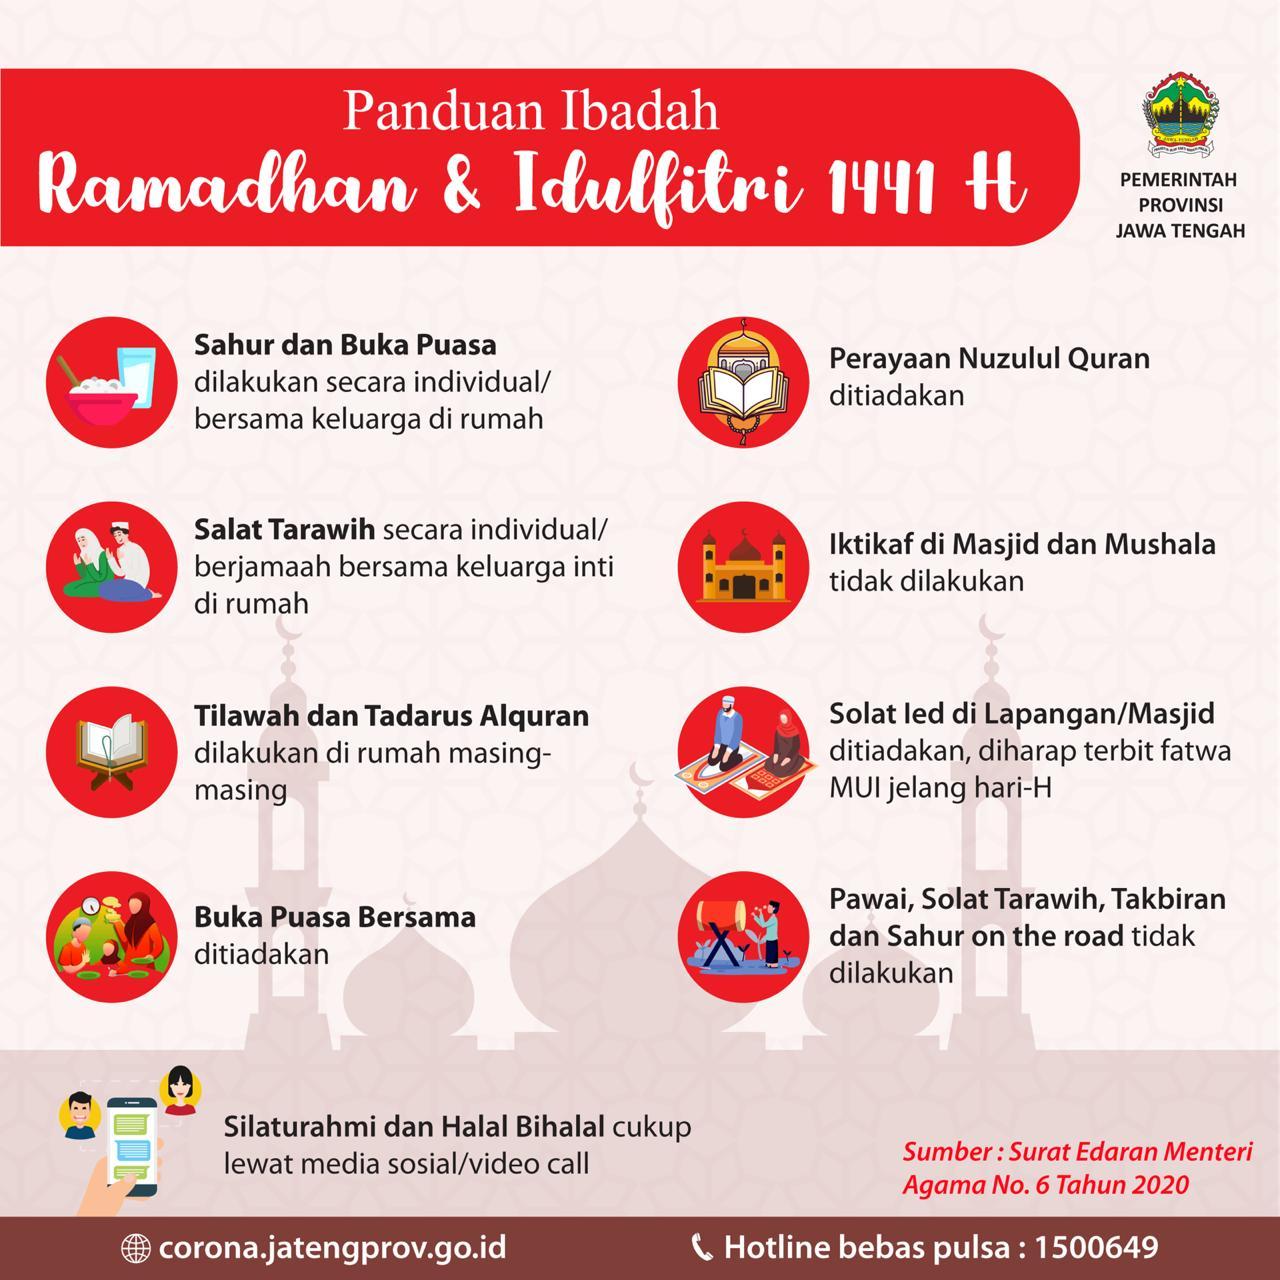 Panduan Ibadah Ramadhan